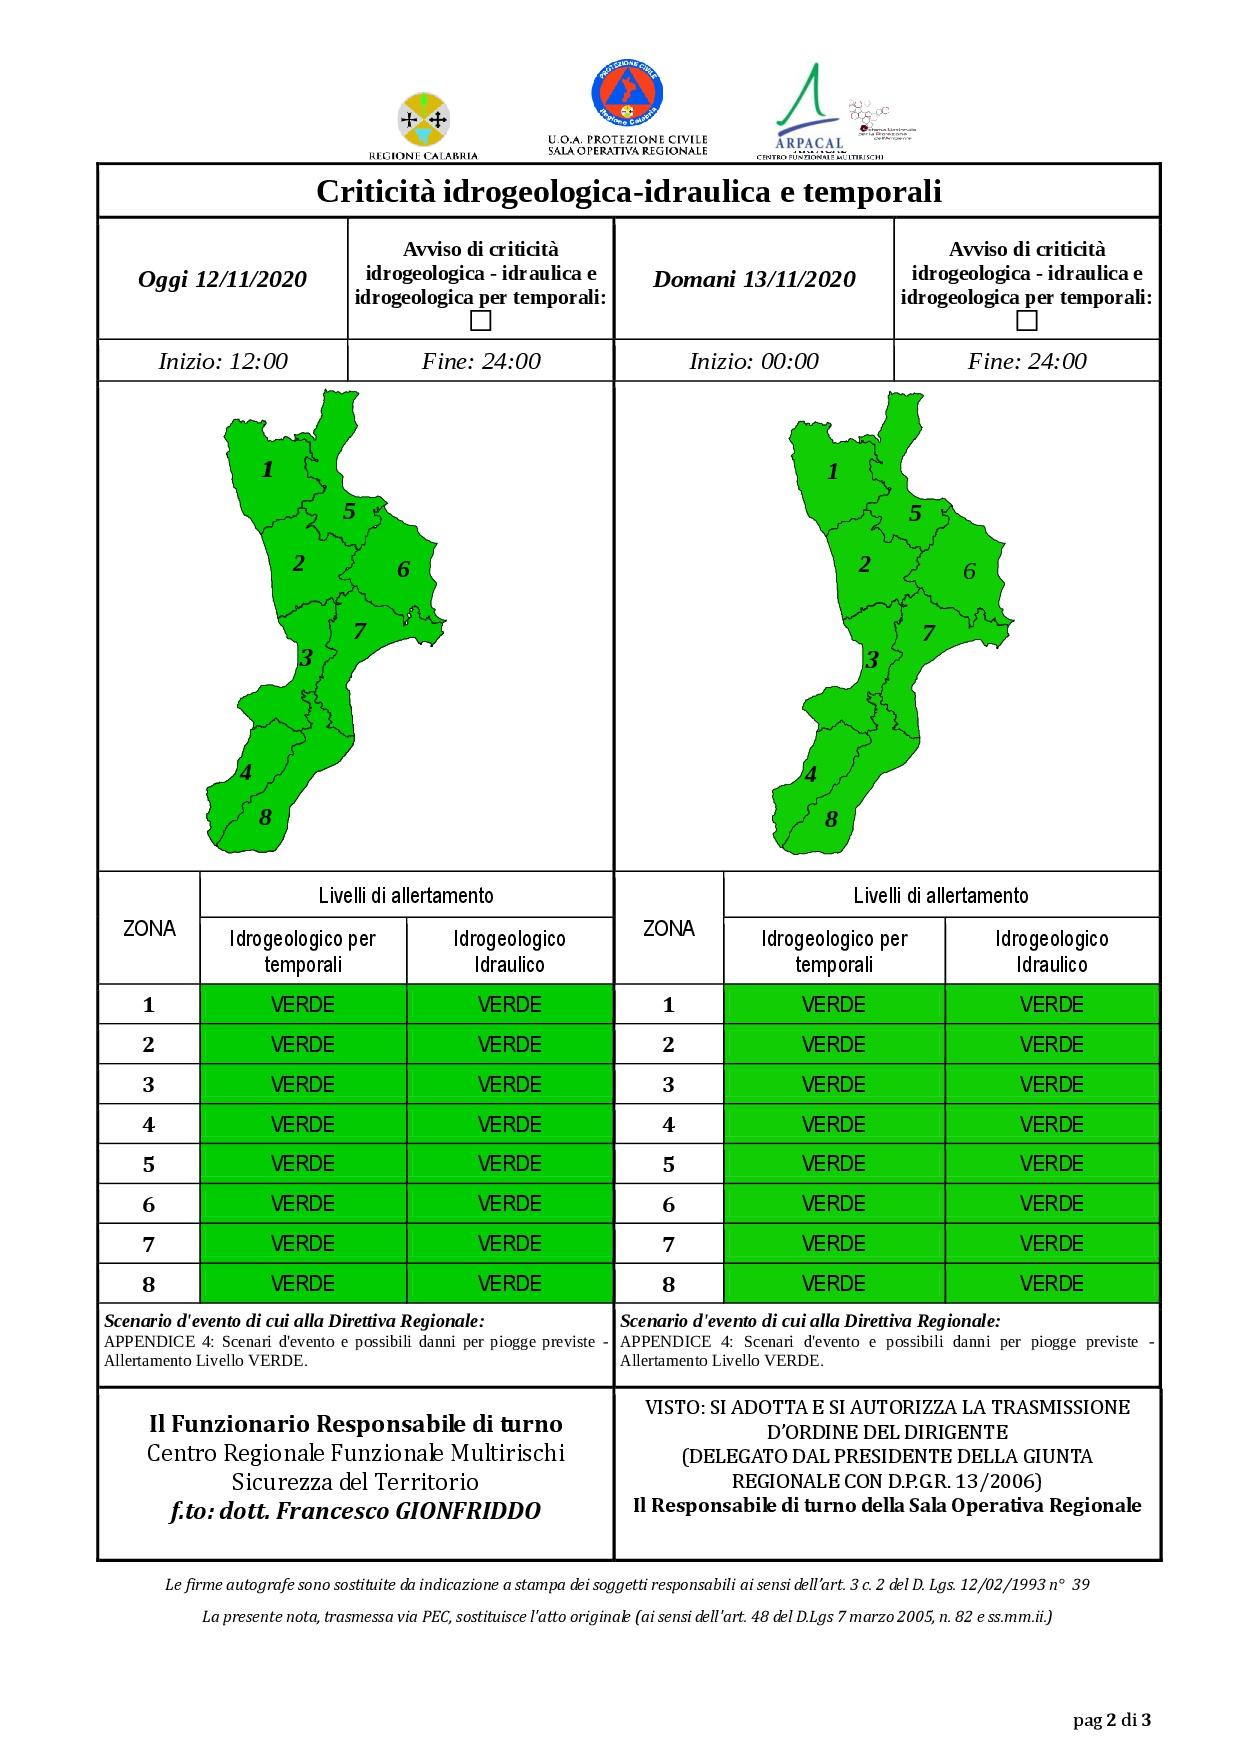 Criticità idrogeologica-idraulica e temporali in Calabria 12-11-2020